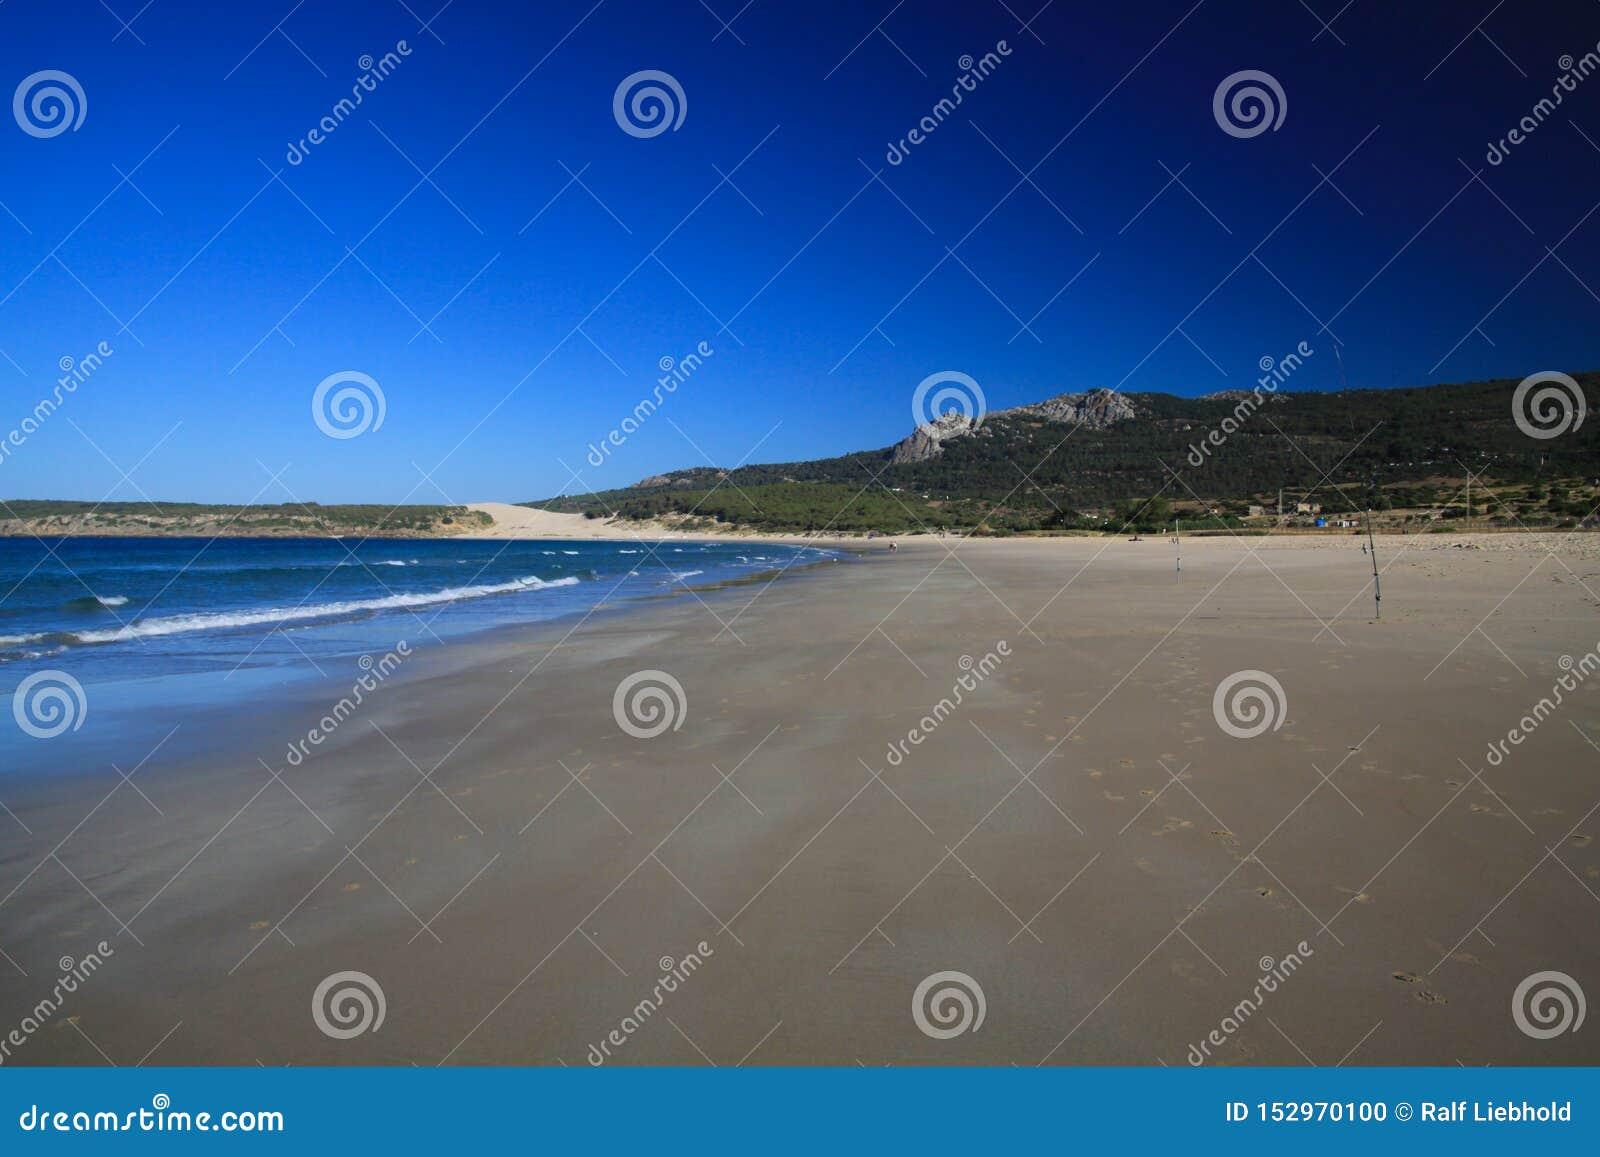 Lonely wide beach in the morning during low tide - Zahara delos Atunes at Costa de la Luz, Spain